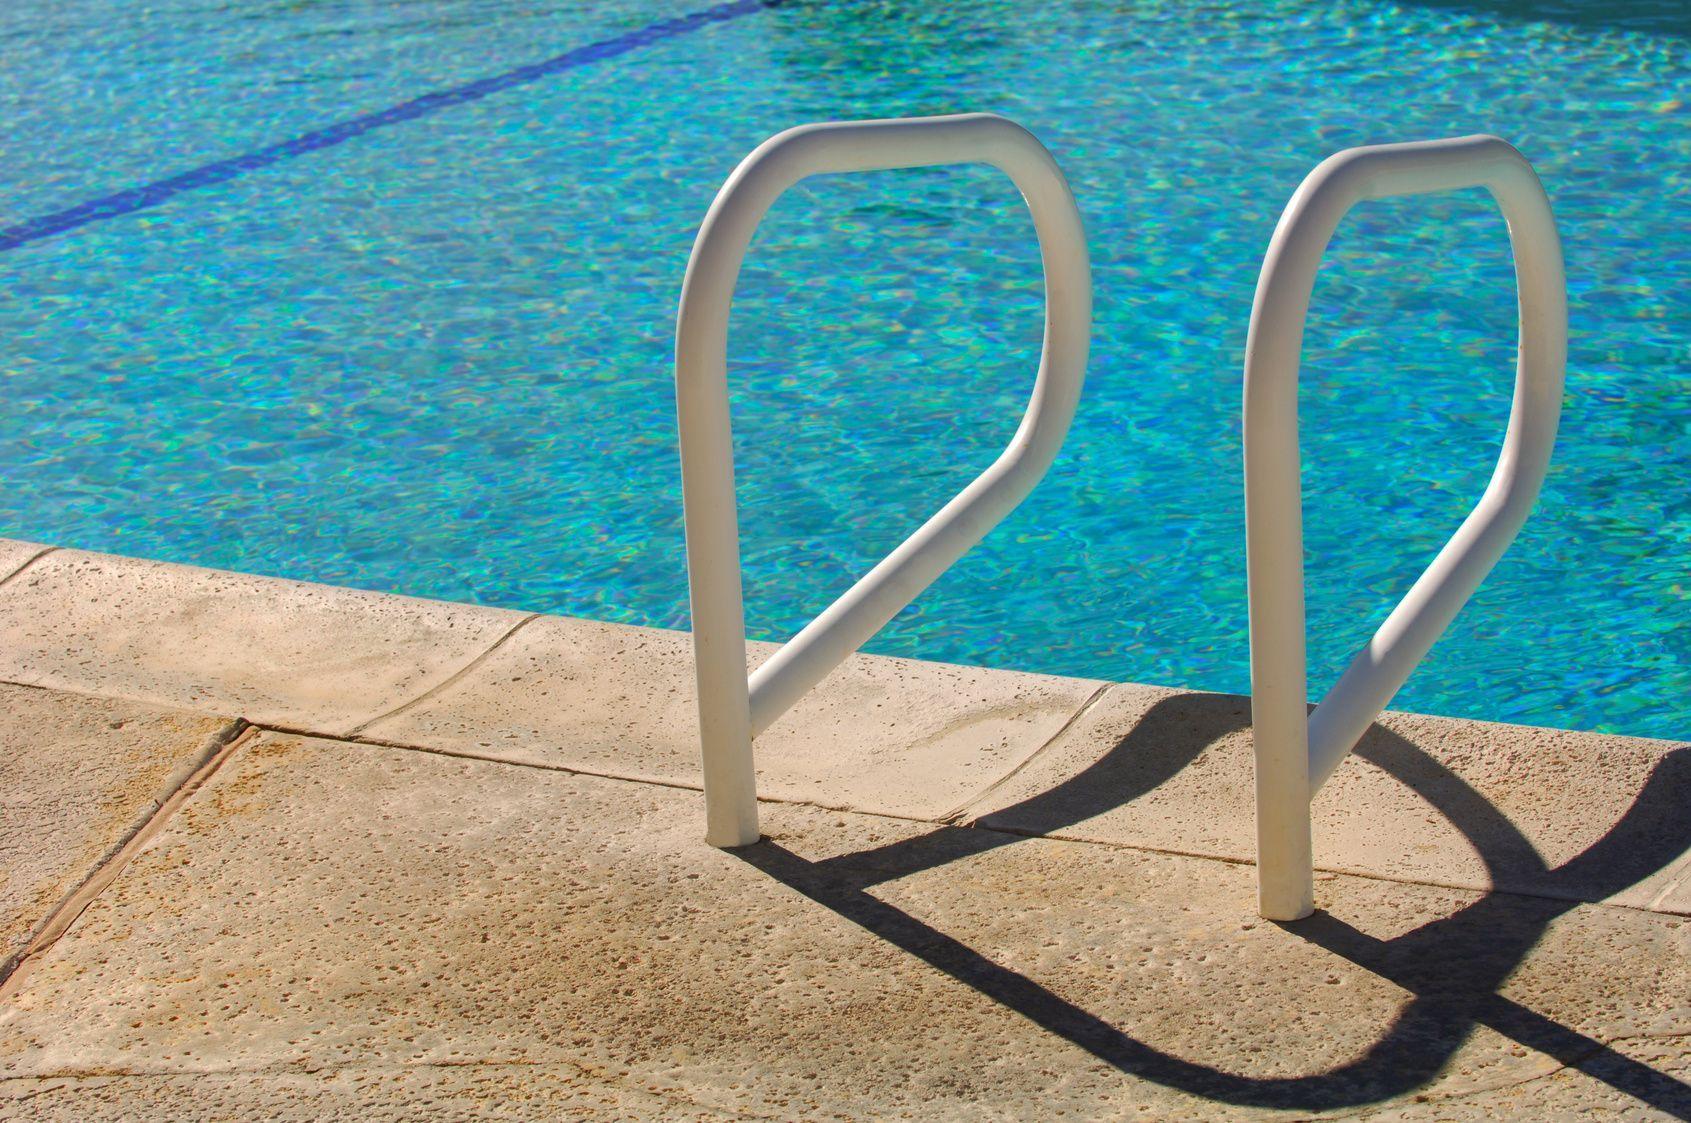 Causas de fugas y goteras en piscinas goteras barcelona for Piscinas en alcampo 2016